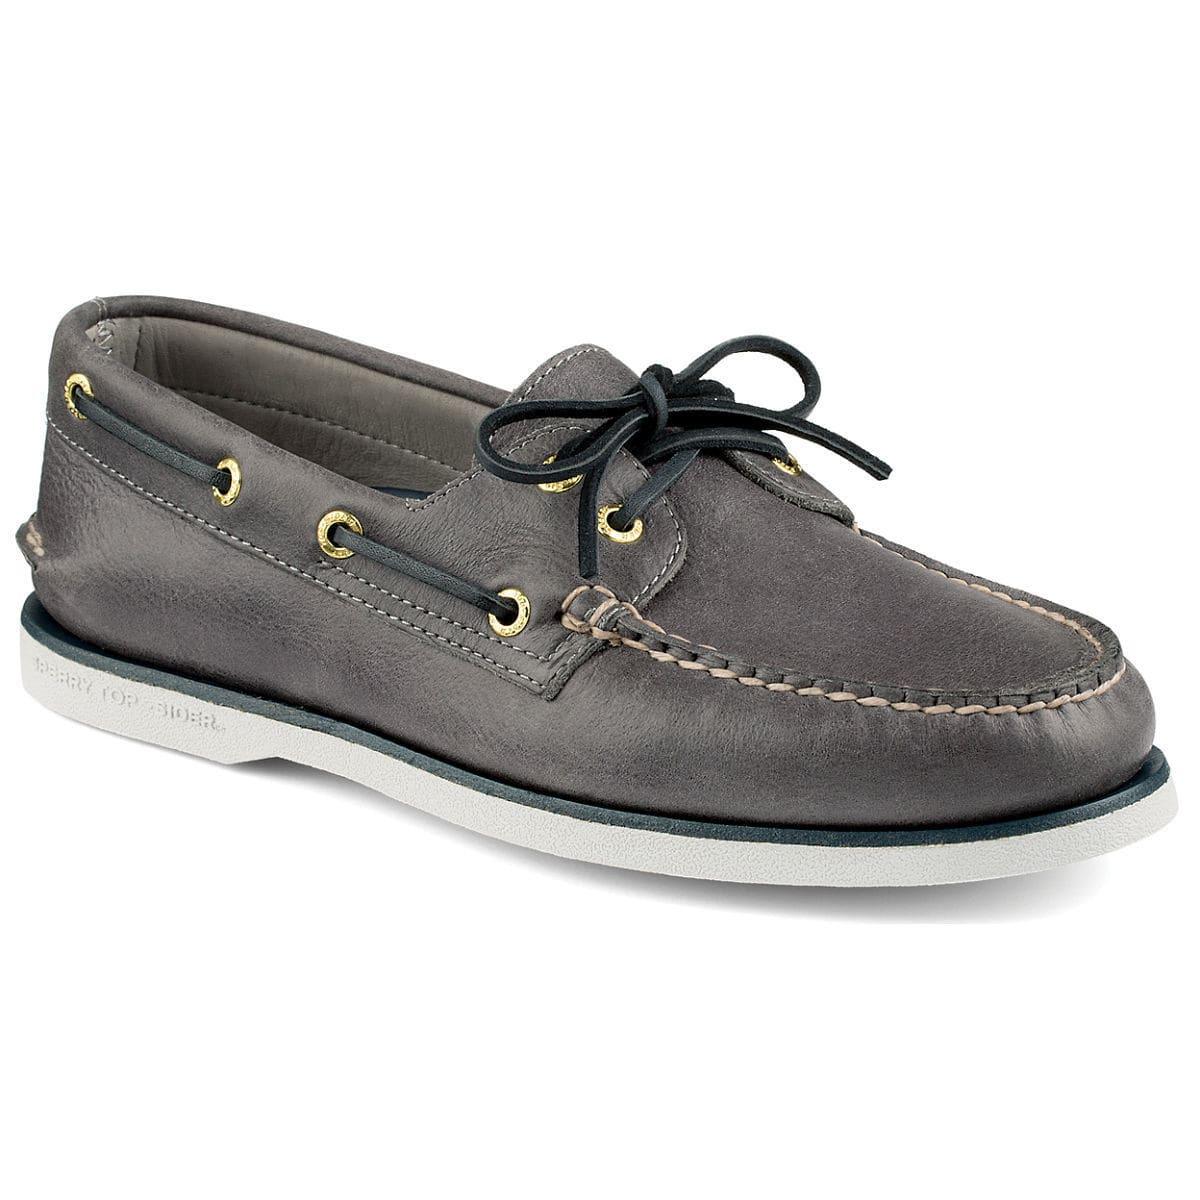 Zapatos de cubierta / para hombre GOLD CUP AUTHENTIC ORIGINAL 2,EYE Sperry Top Sider